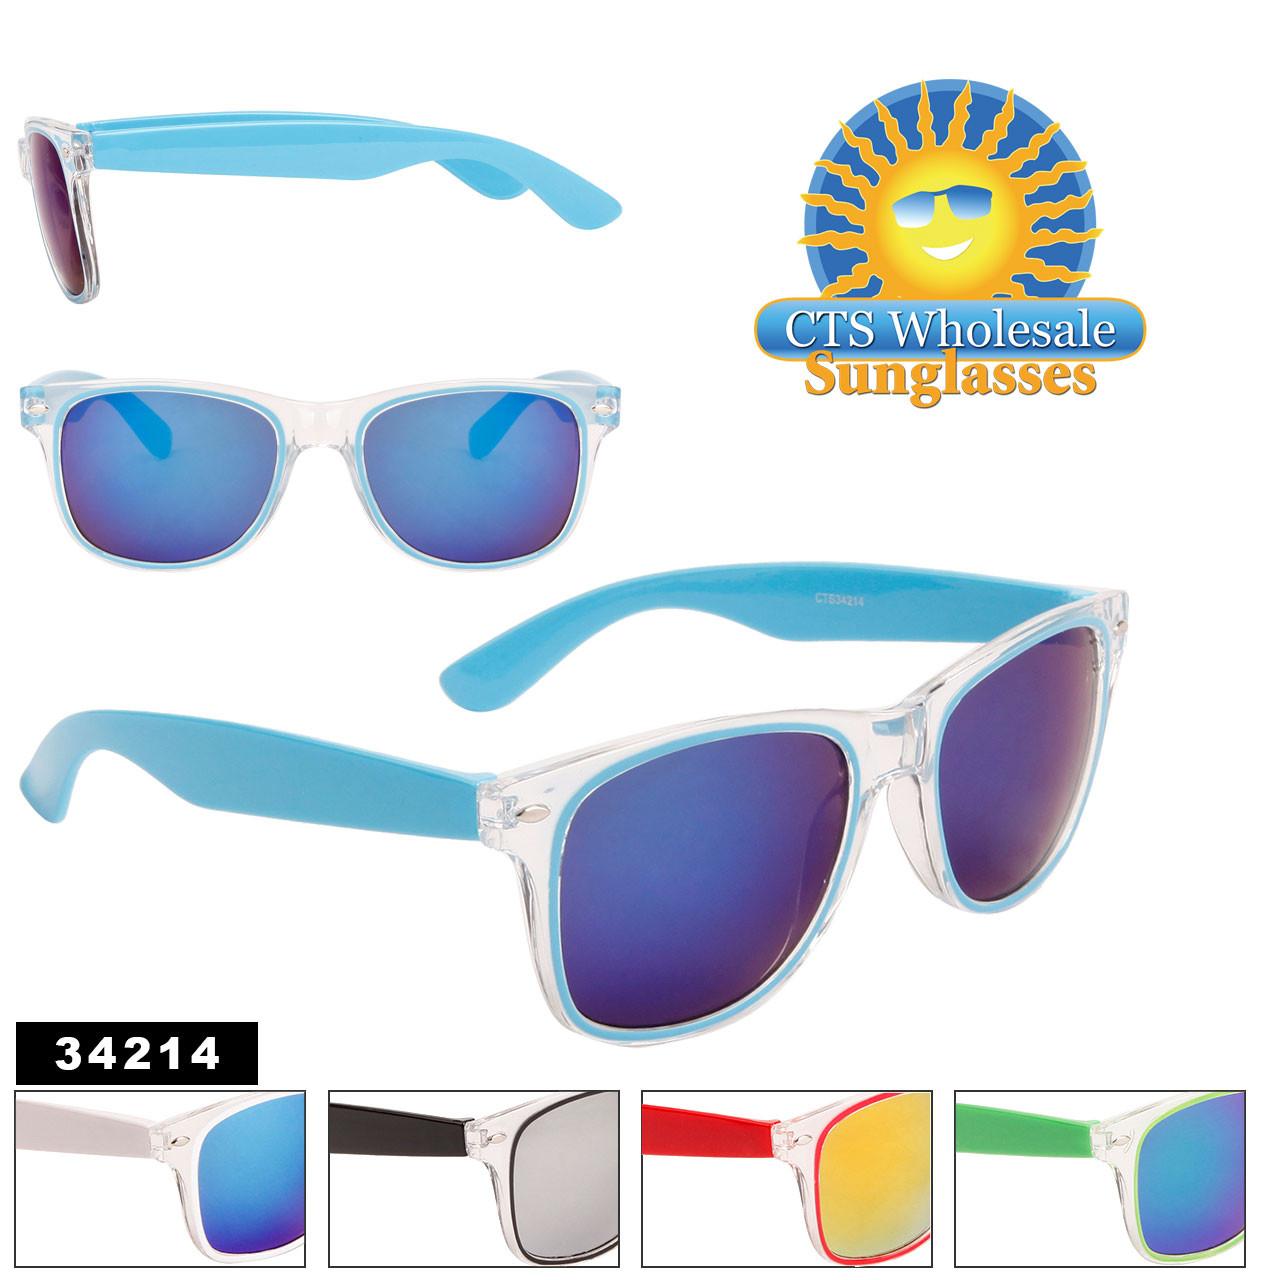 Mirrored California Classics Sunglasses Wholesale - Style #34214